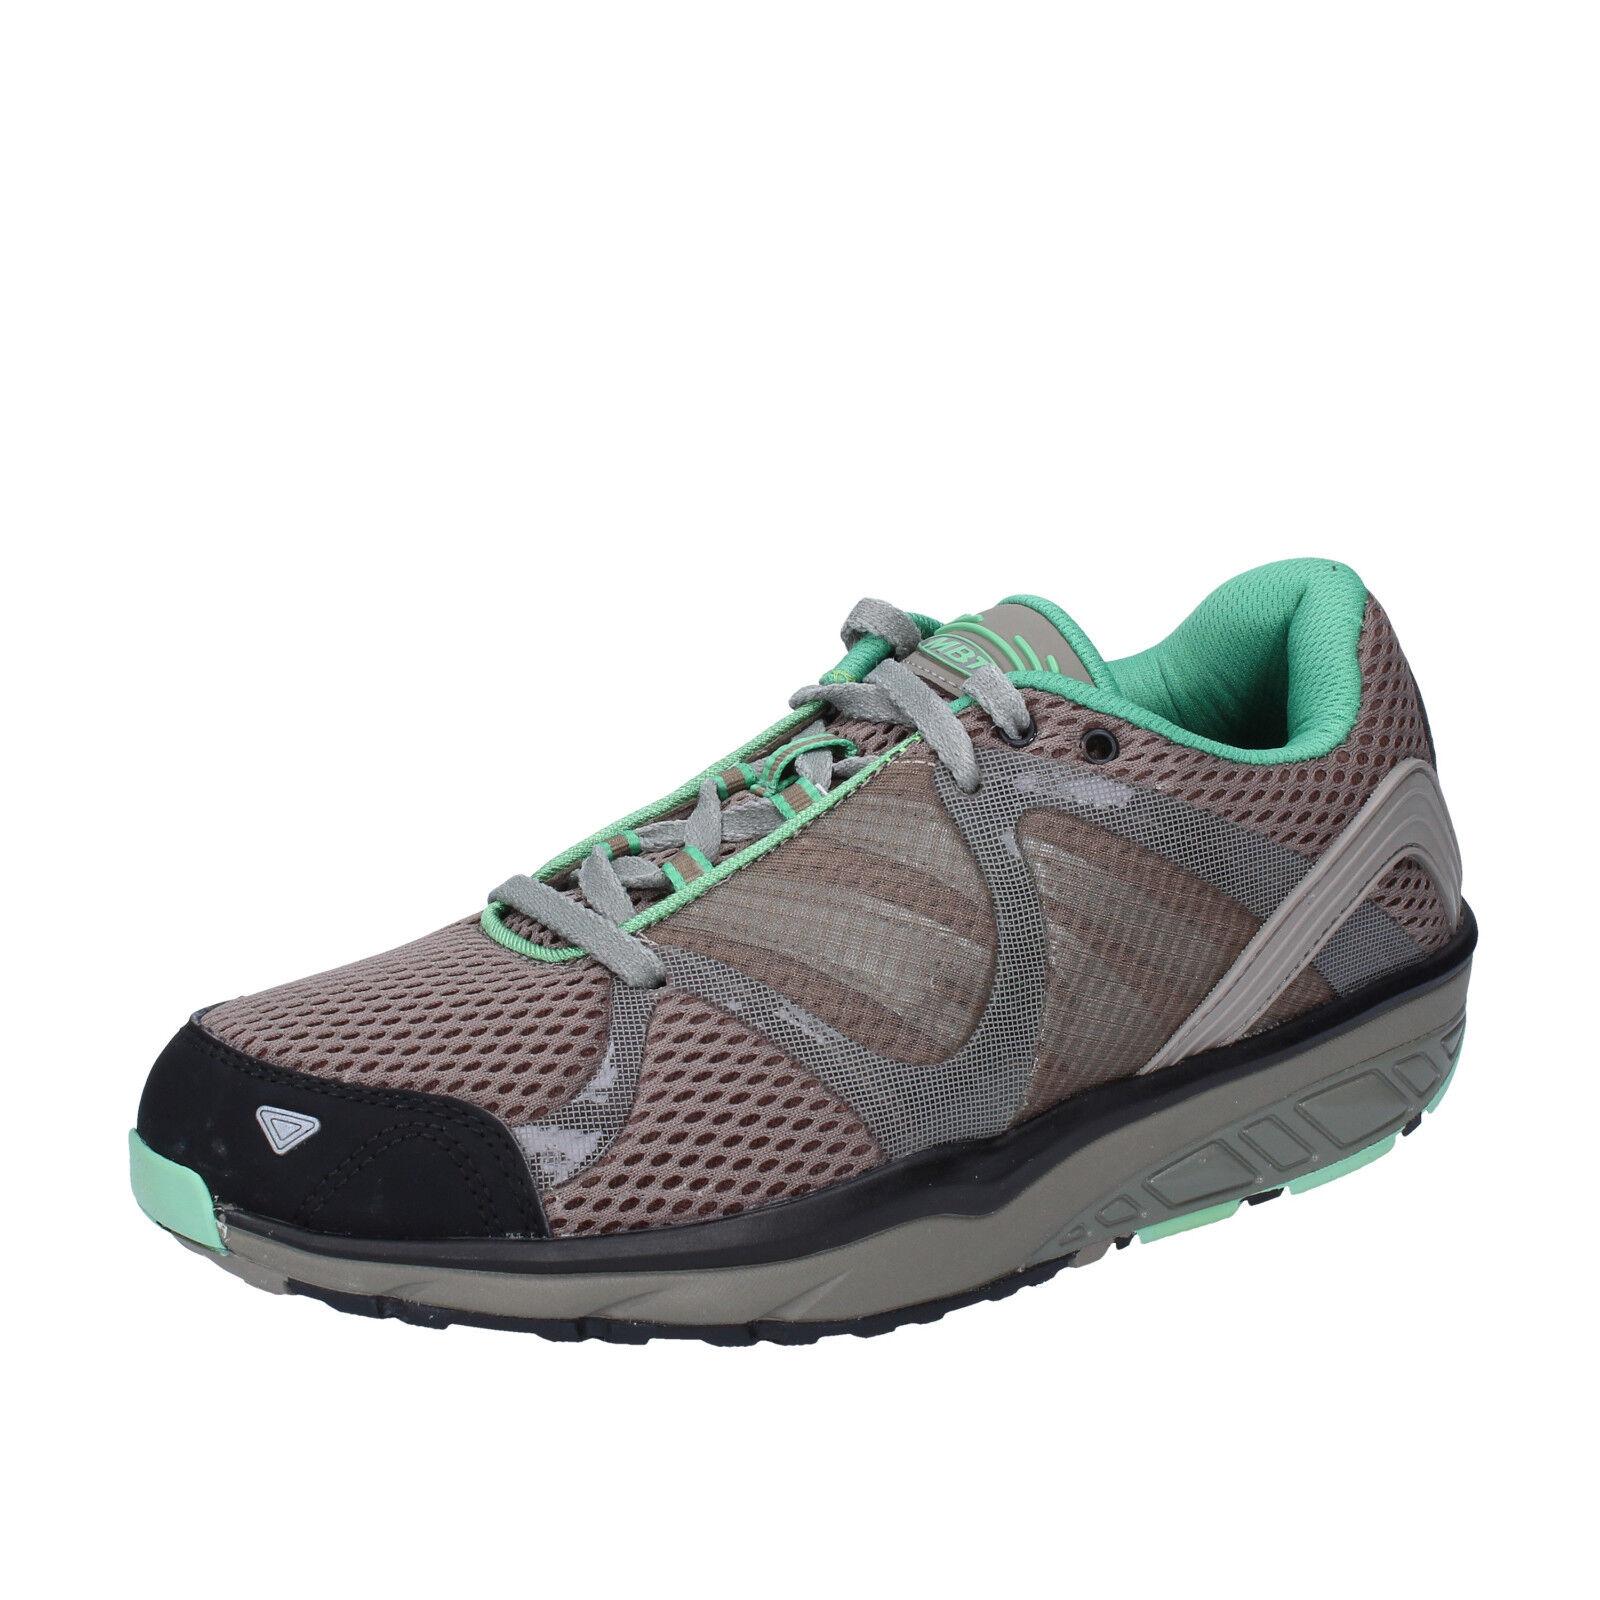 scarpe donna MBT tessuto LEASHA TRAIL 37 EU sneakers grigio tessuto MBT dynamic BX902-37 1c2a71